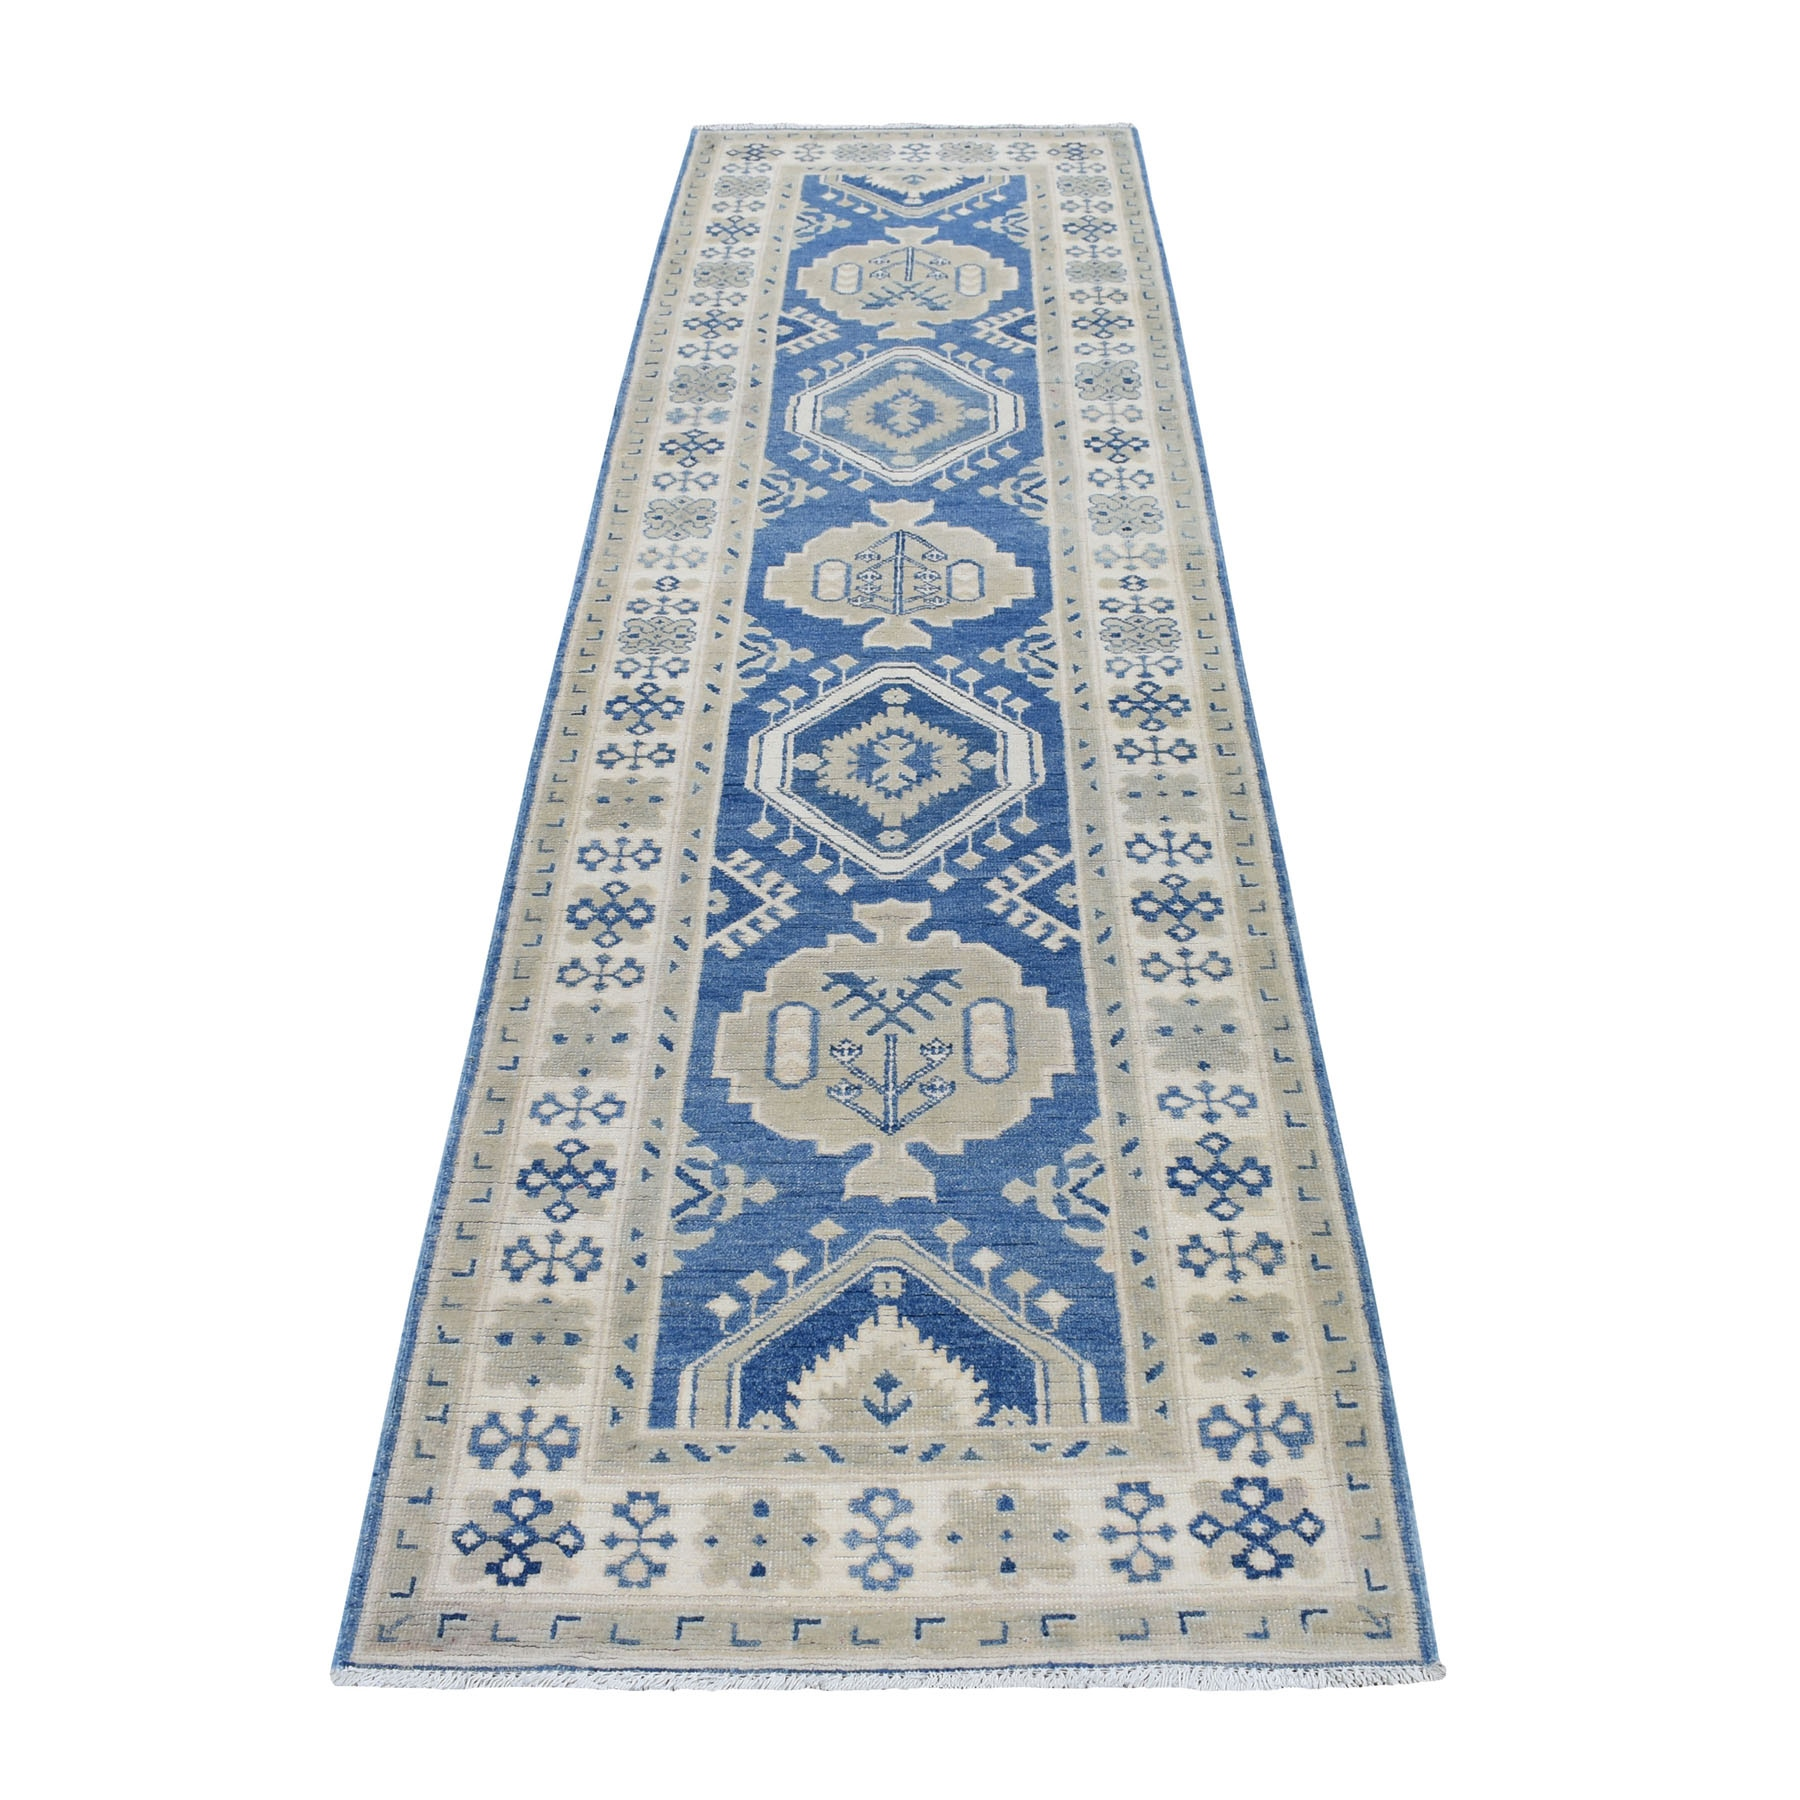 "2'8""X9'7"" Blue Vintage Look Kazak Tribal Design Pure Wool Hand Knotted Runner Oriental Rug moaed68c"